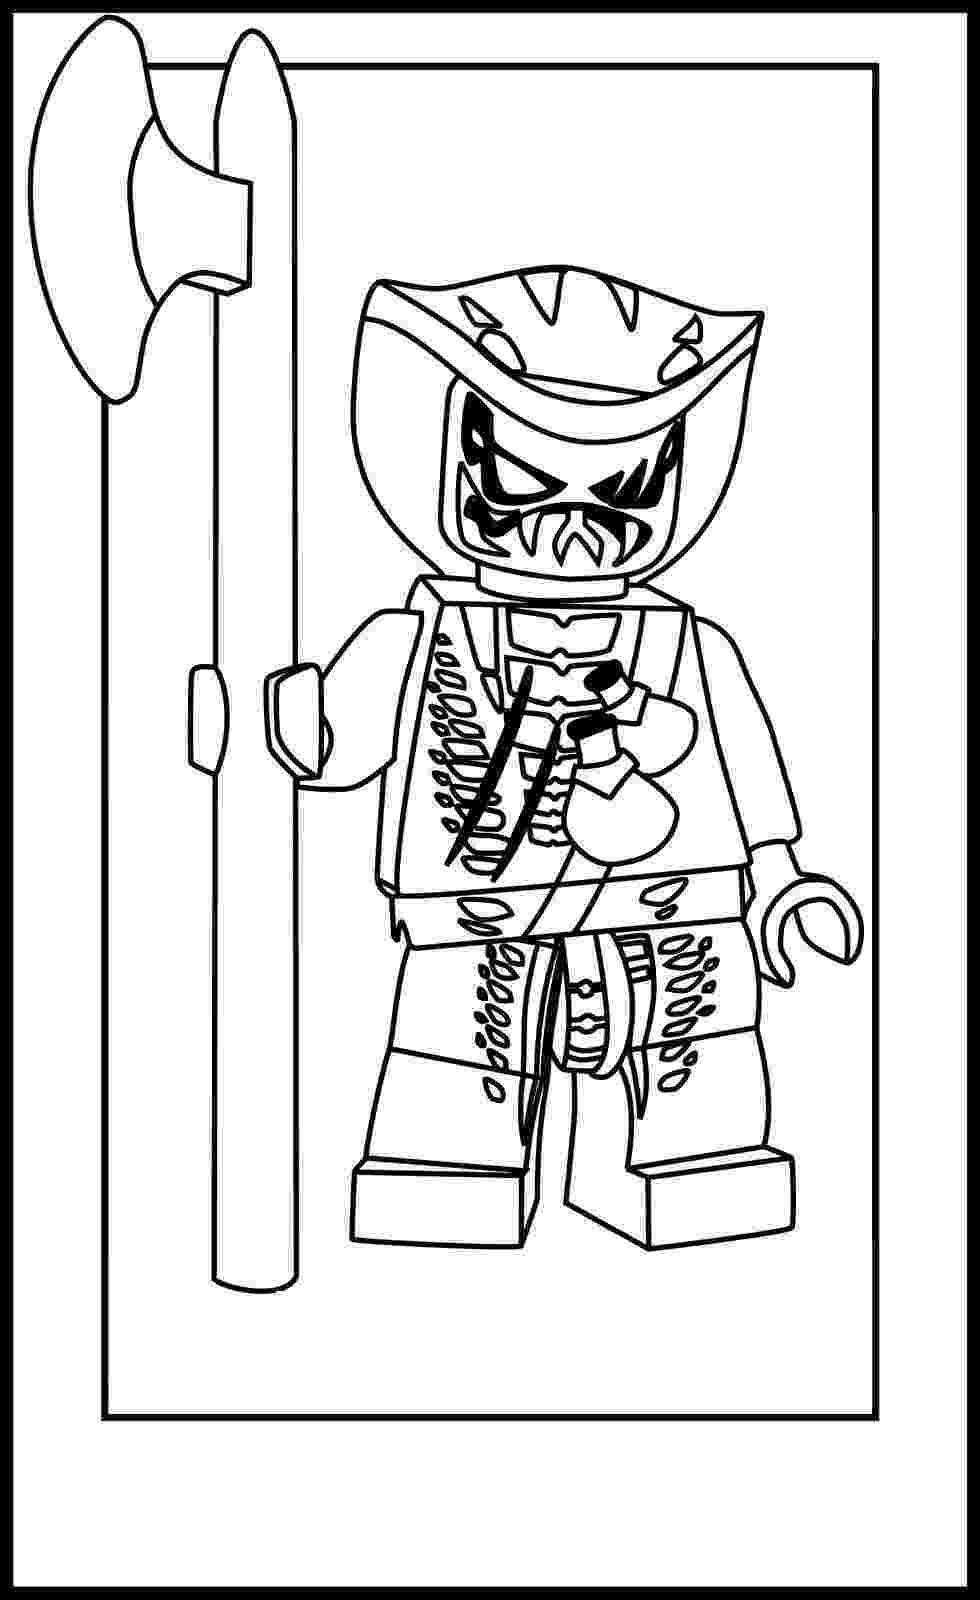 pictures of lego ninjago lego ninjago pythor coloring pages top free printable of ninjago lego pictures